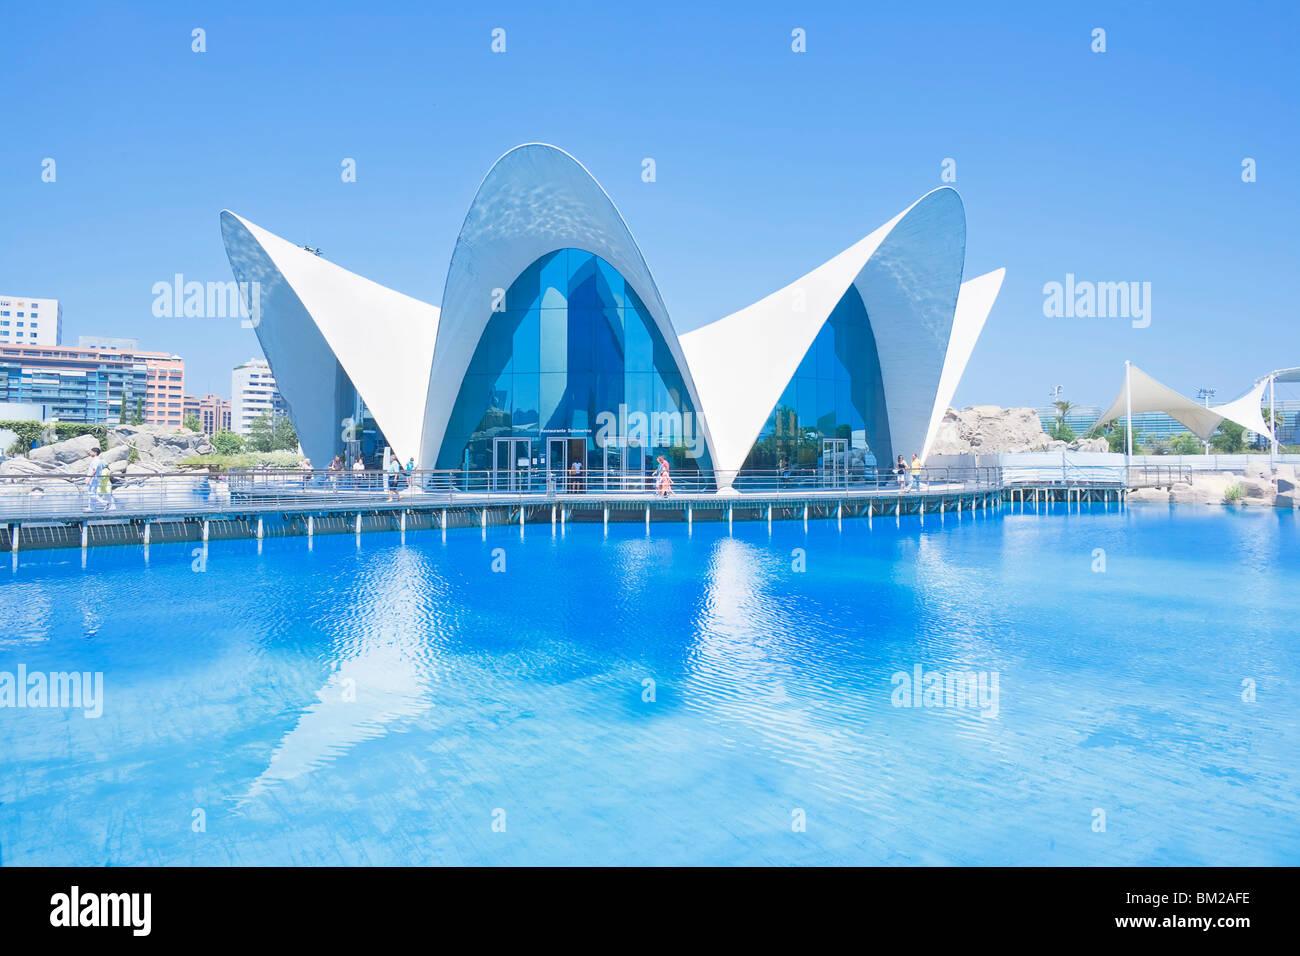 Oceanografic, City of Arts and Sciences, Valencia, Comunidad Autonoma de Valencia, Spain - Stock Image